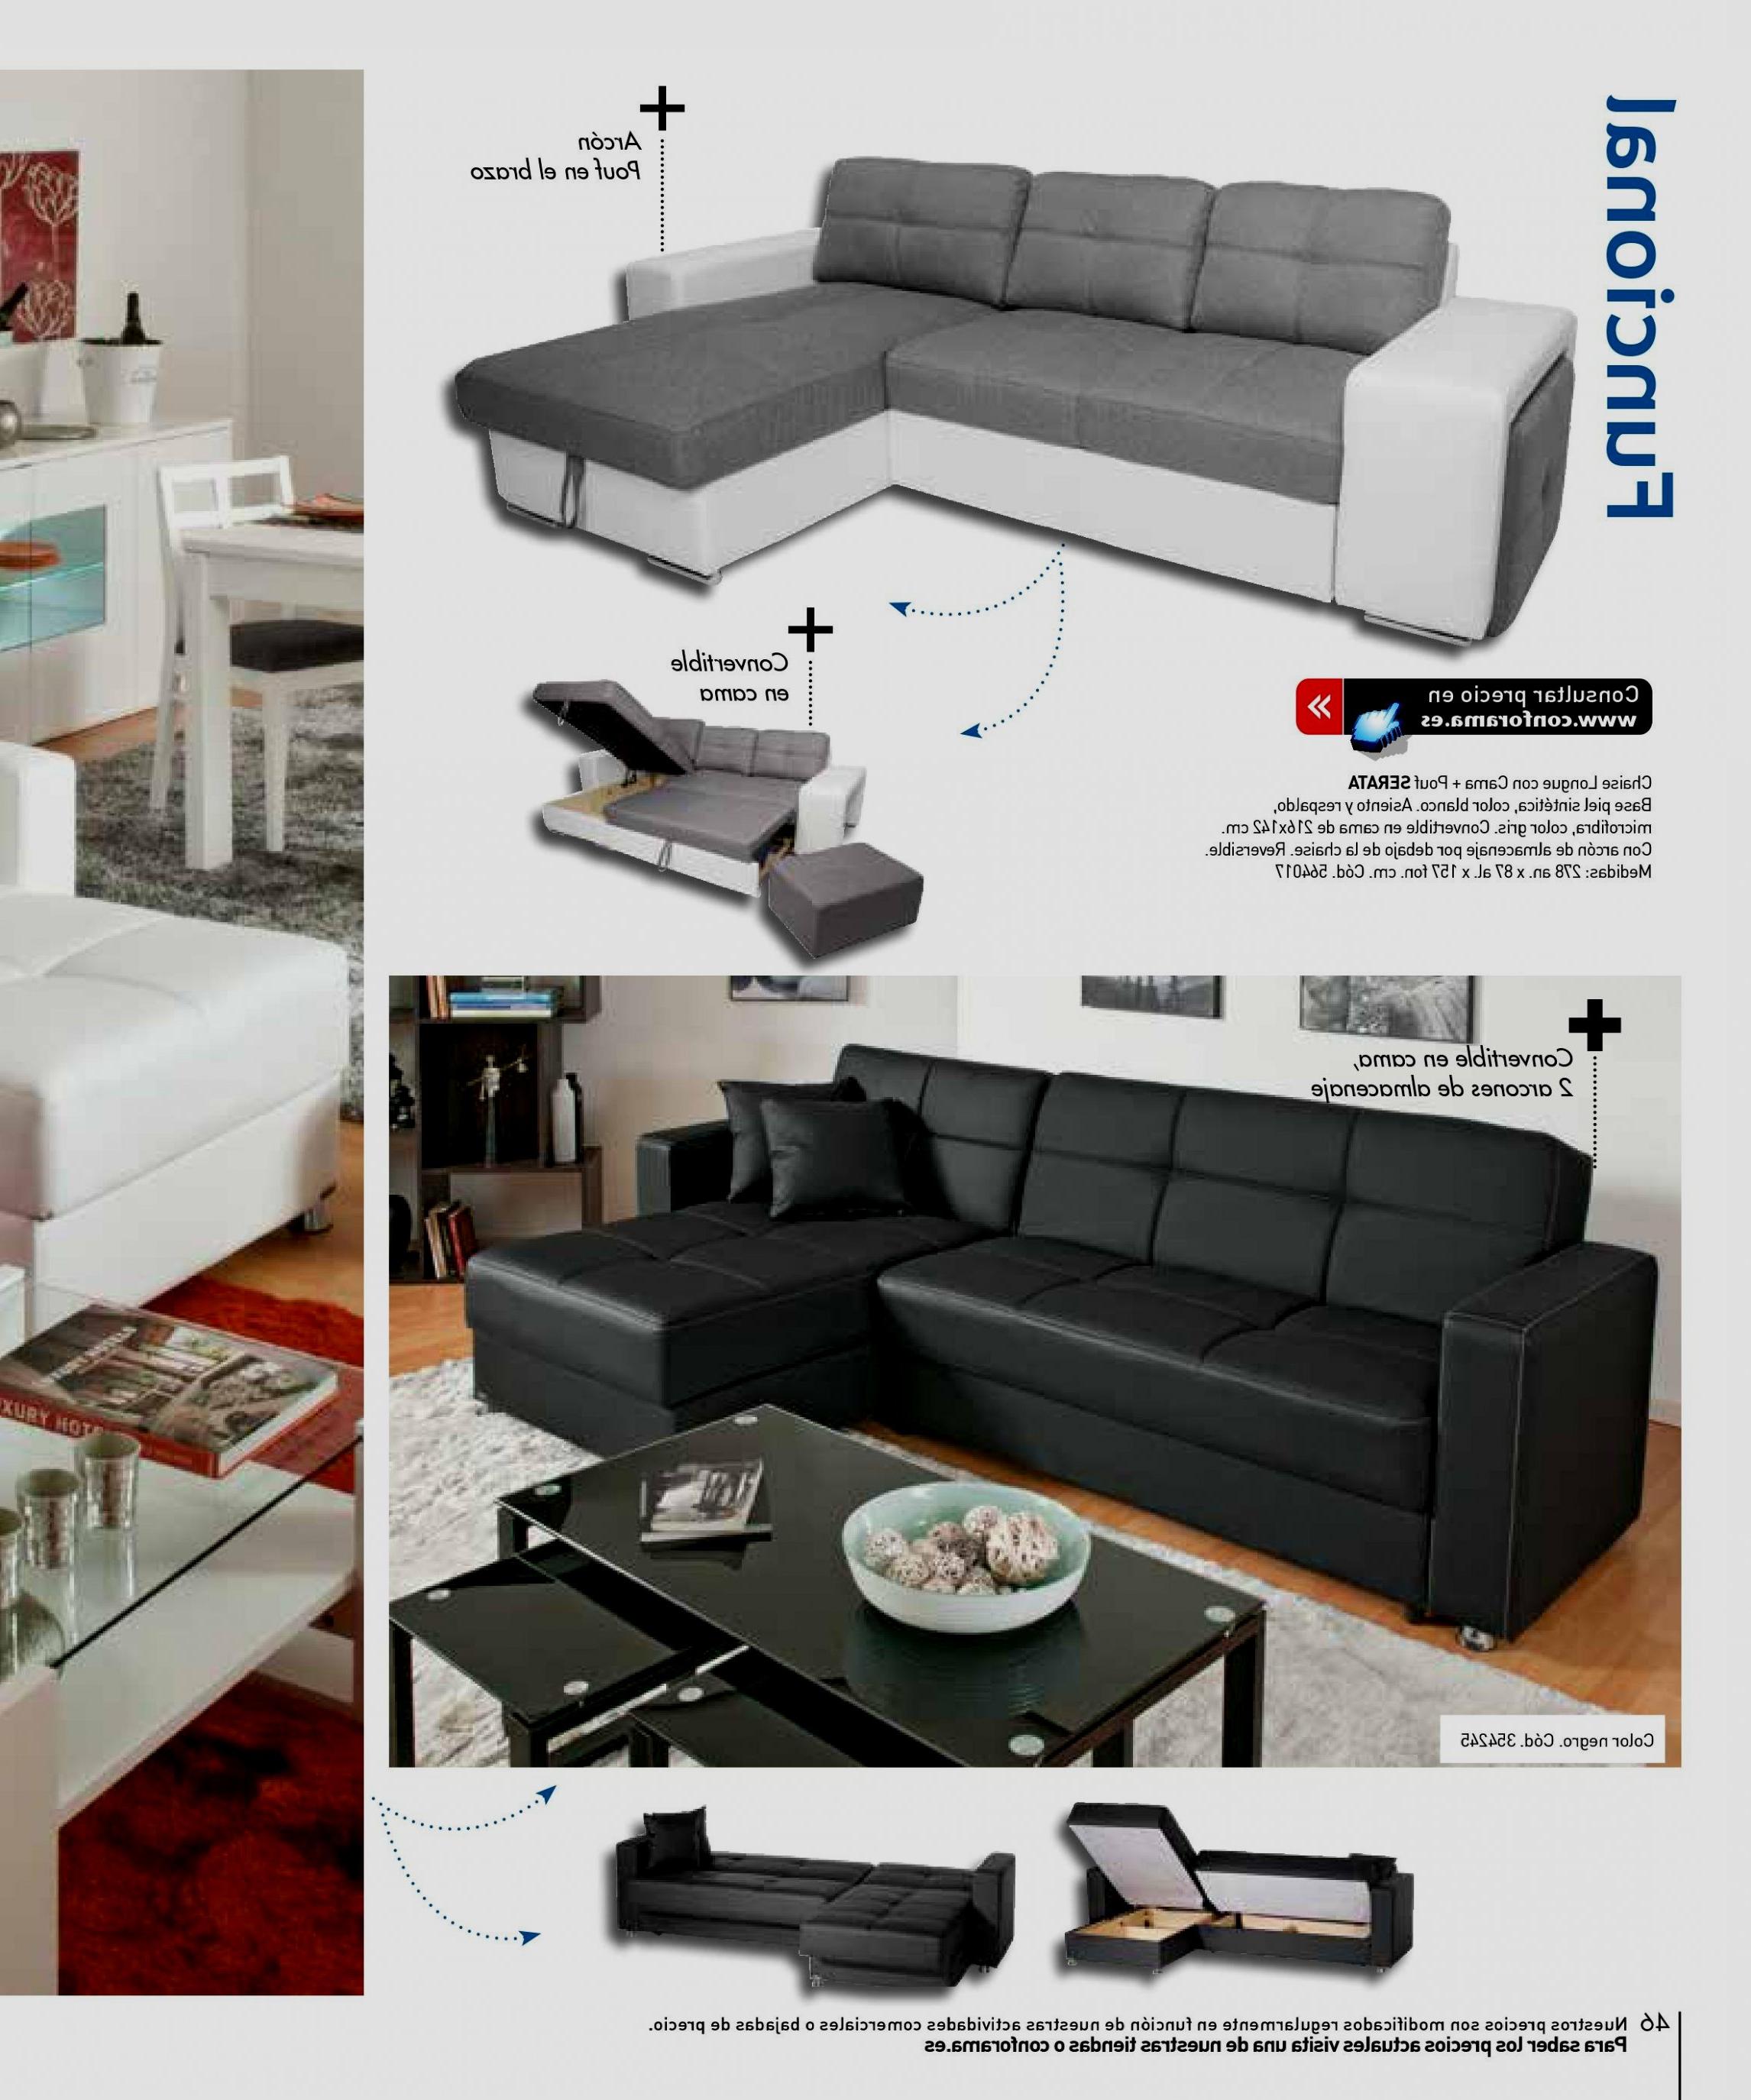 Sofas Cheslong Conforama Dwdk sofas Cheslong Conforama Bello Conforama sofas Unique Conforama sofa